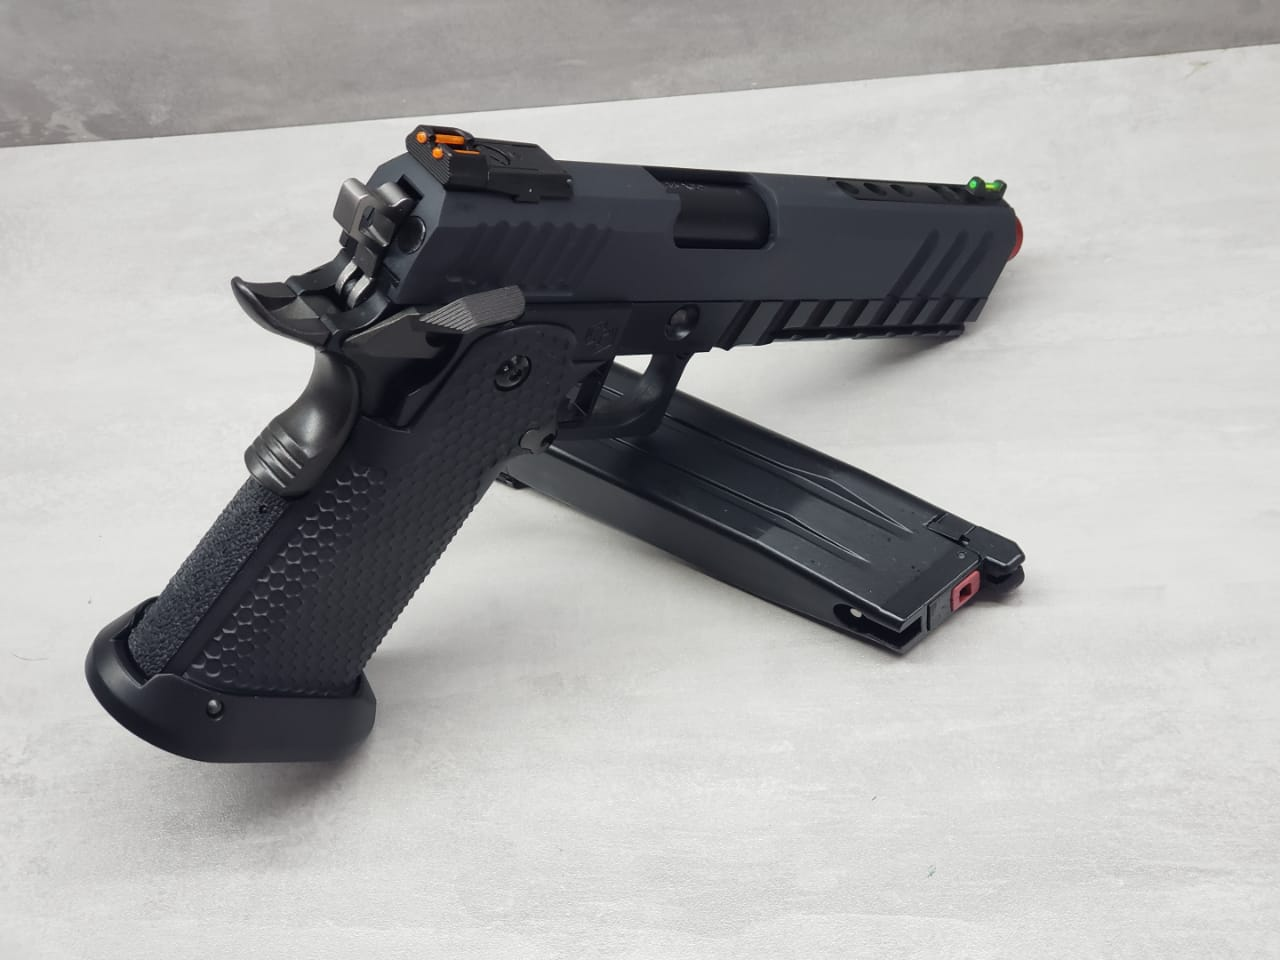 Pistola Airsoft Armorer Works Hicapa HX2033 Full Auto